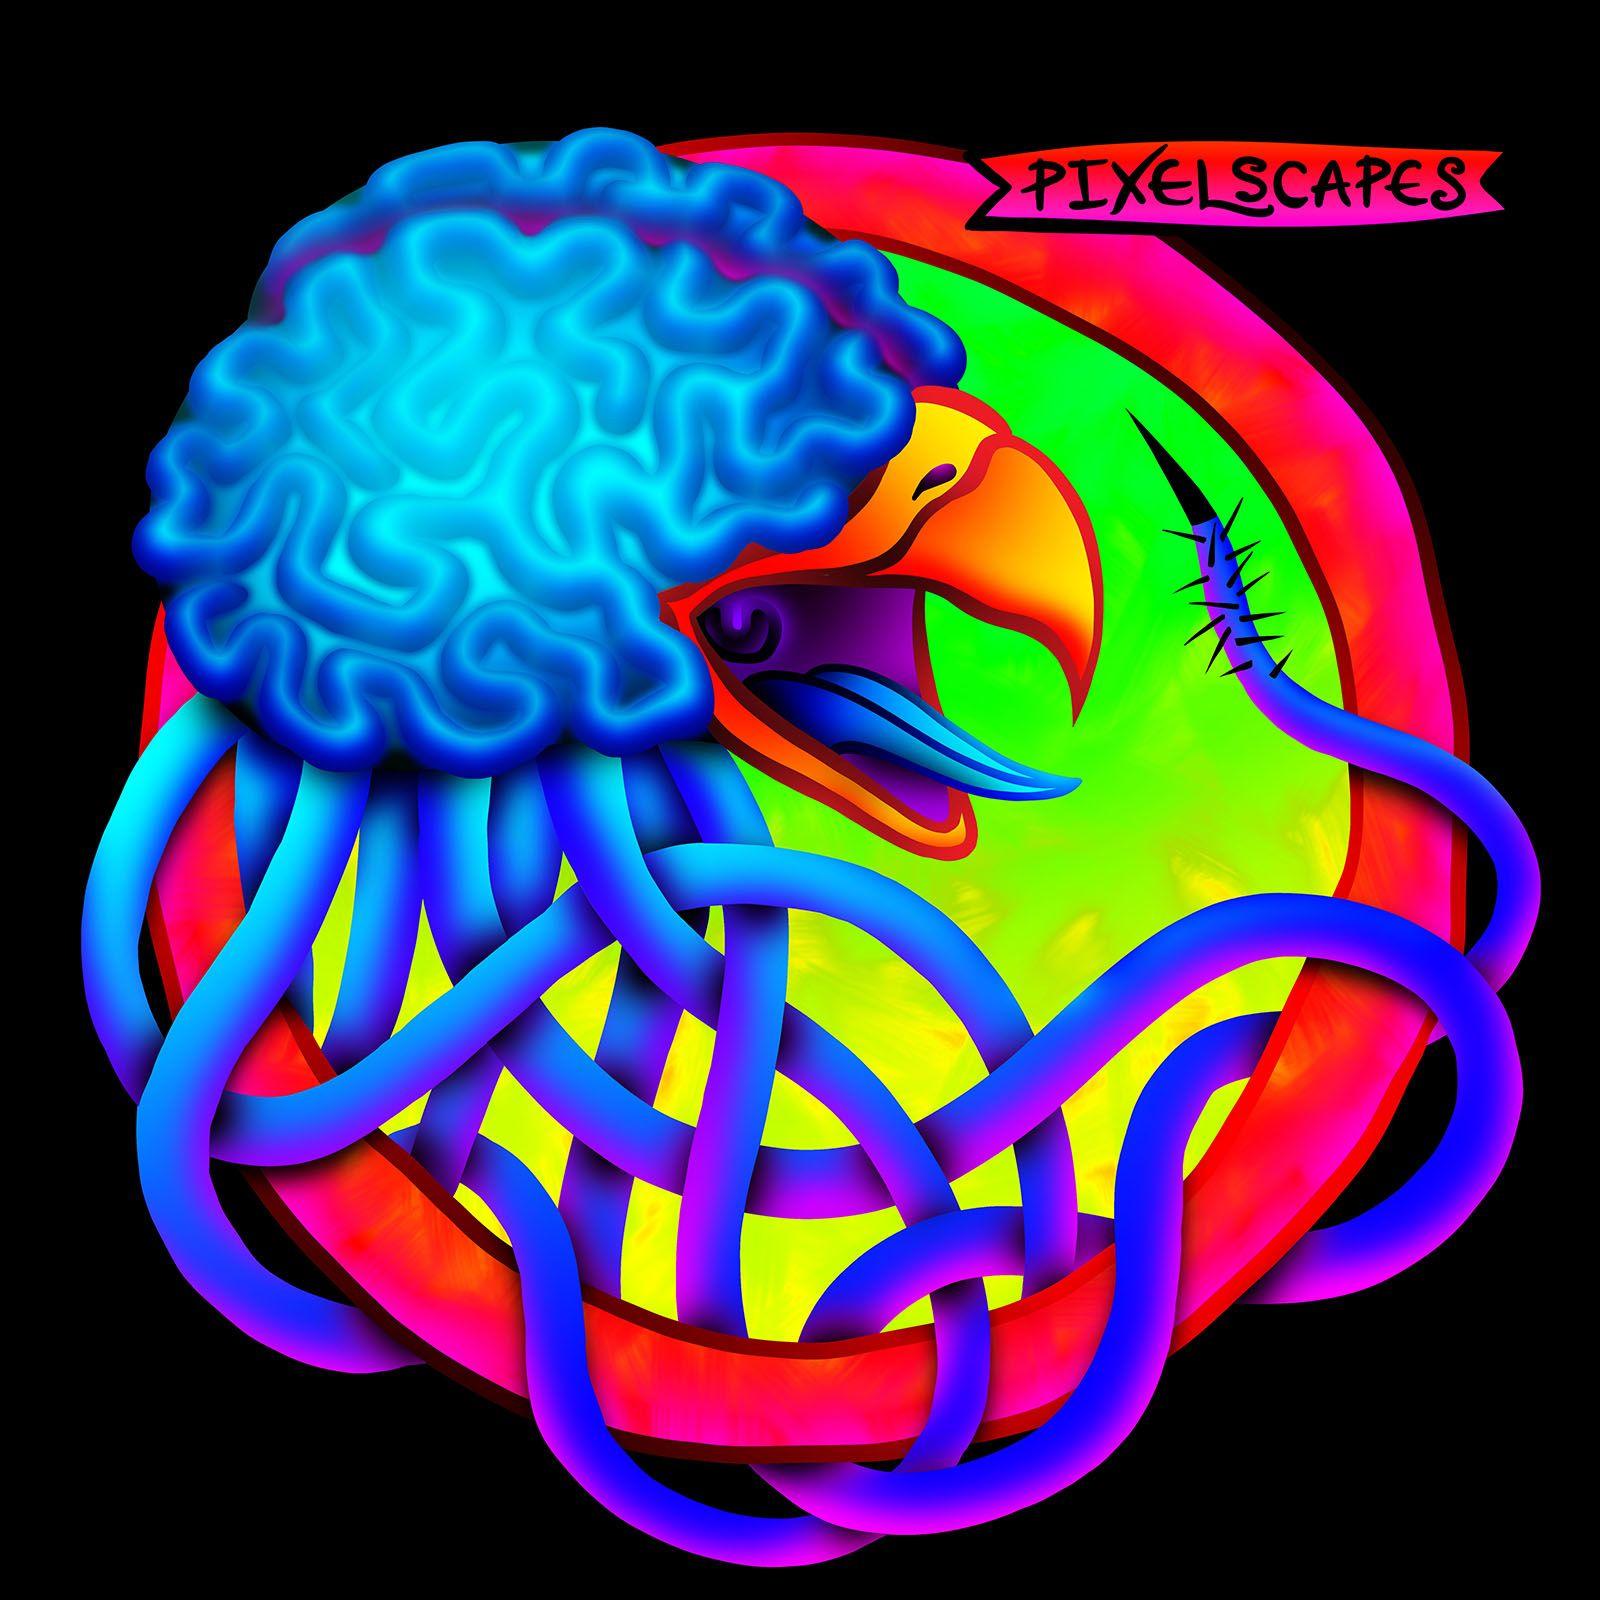 Is it too easy of a pun for me to call this a bird brain? At least ...